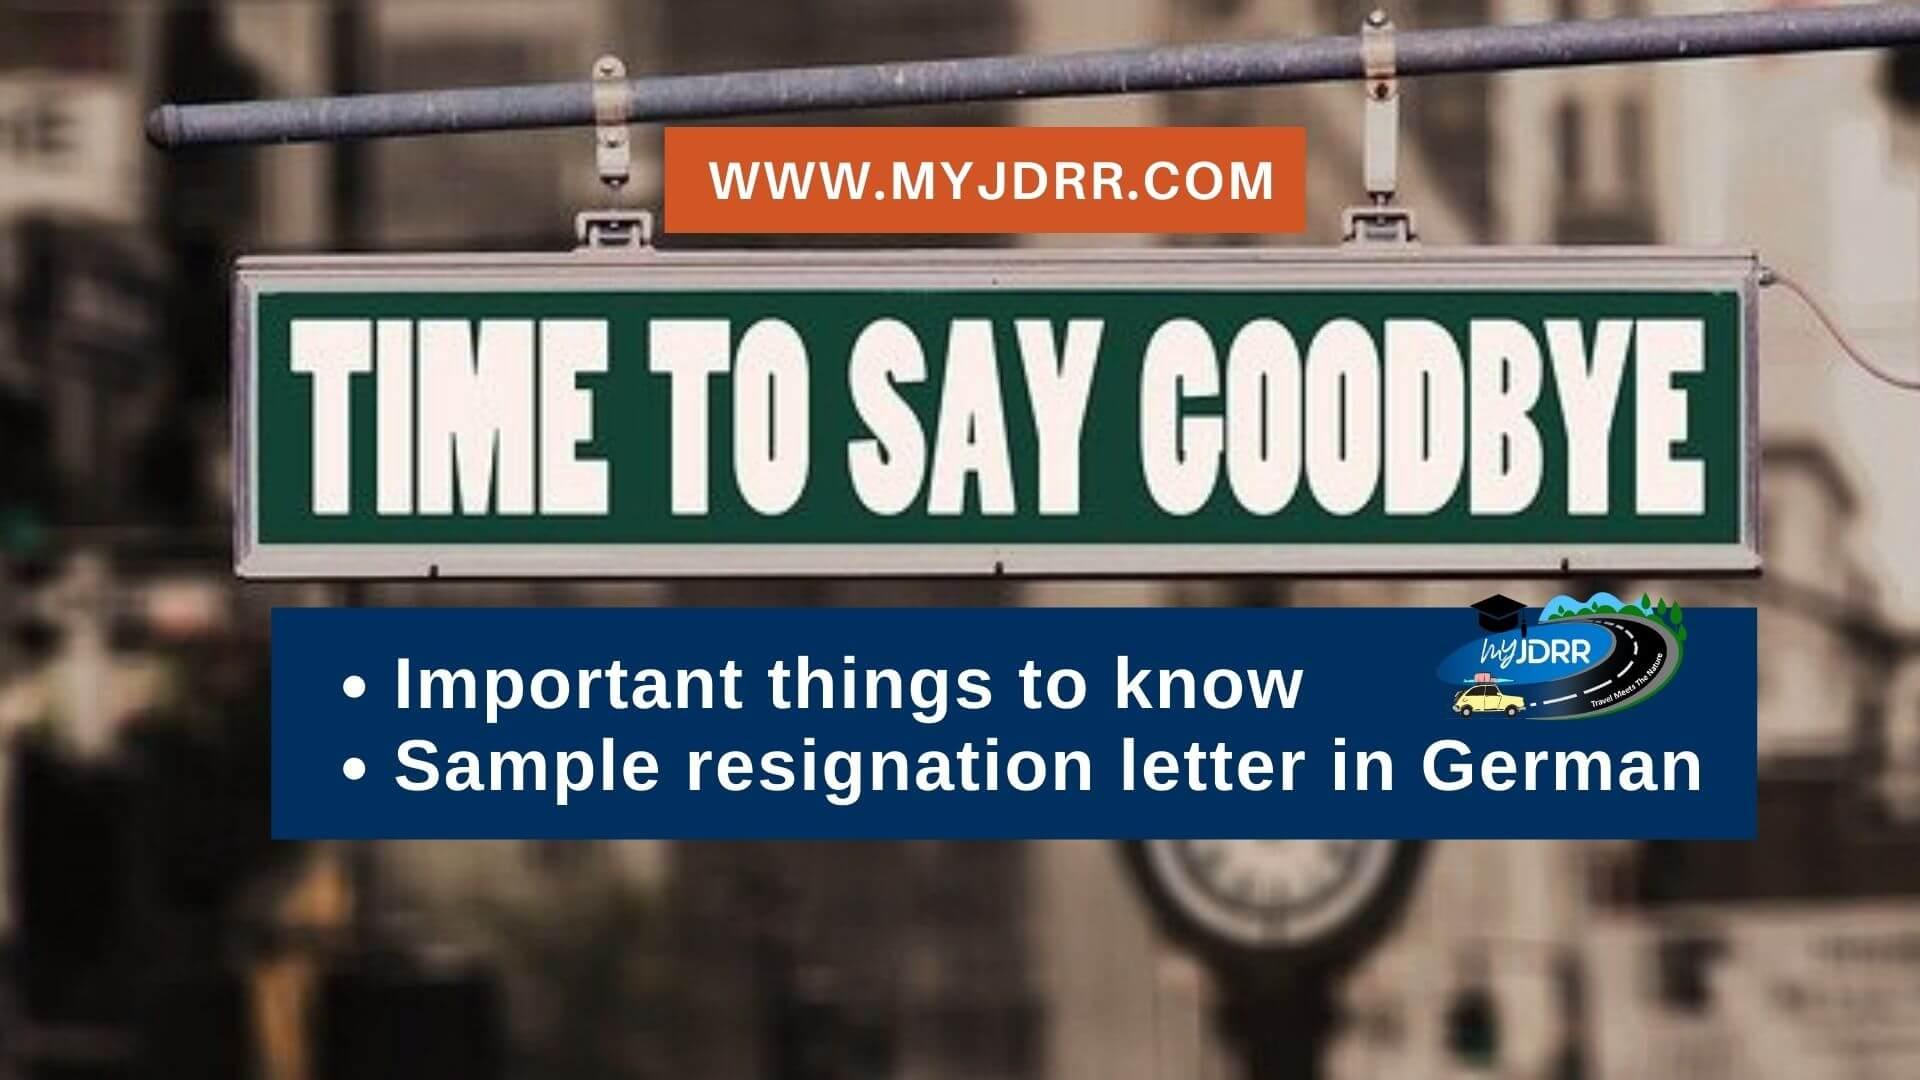 Job resignation in Germany